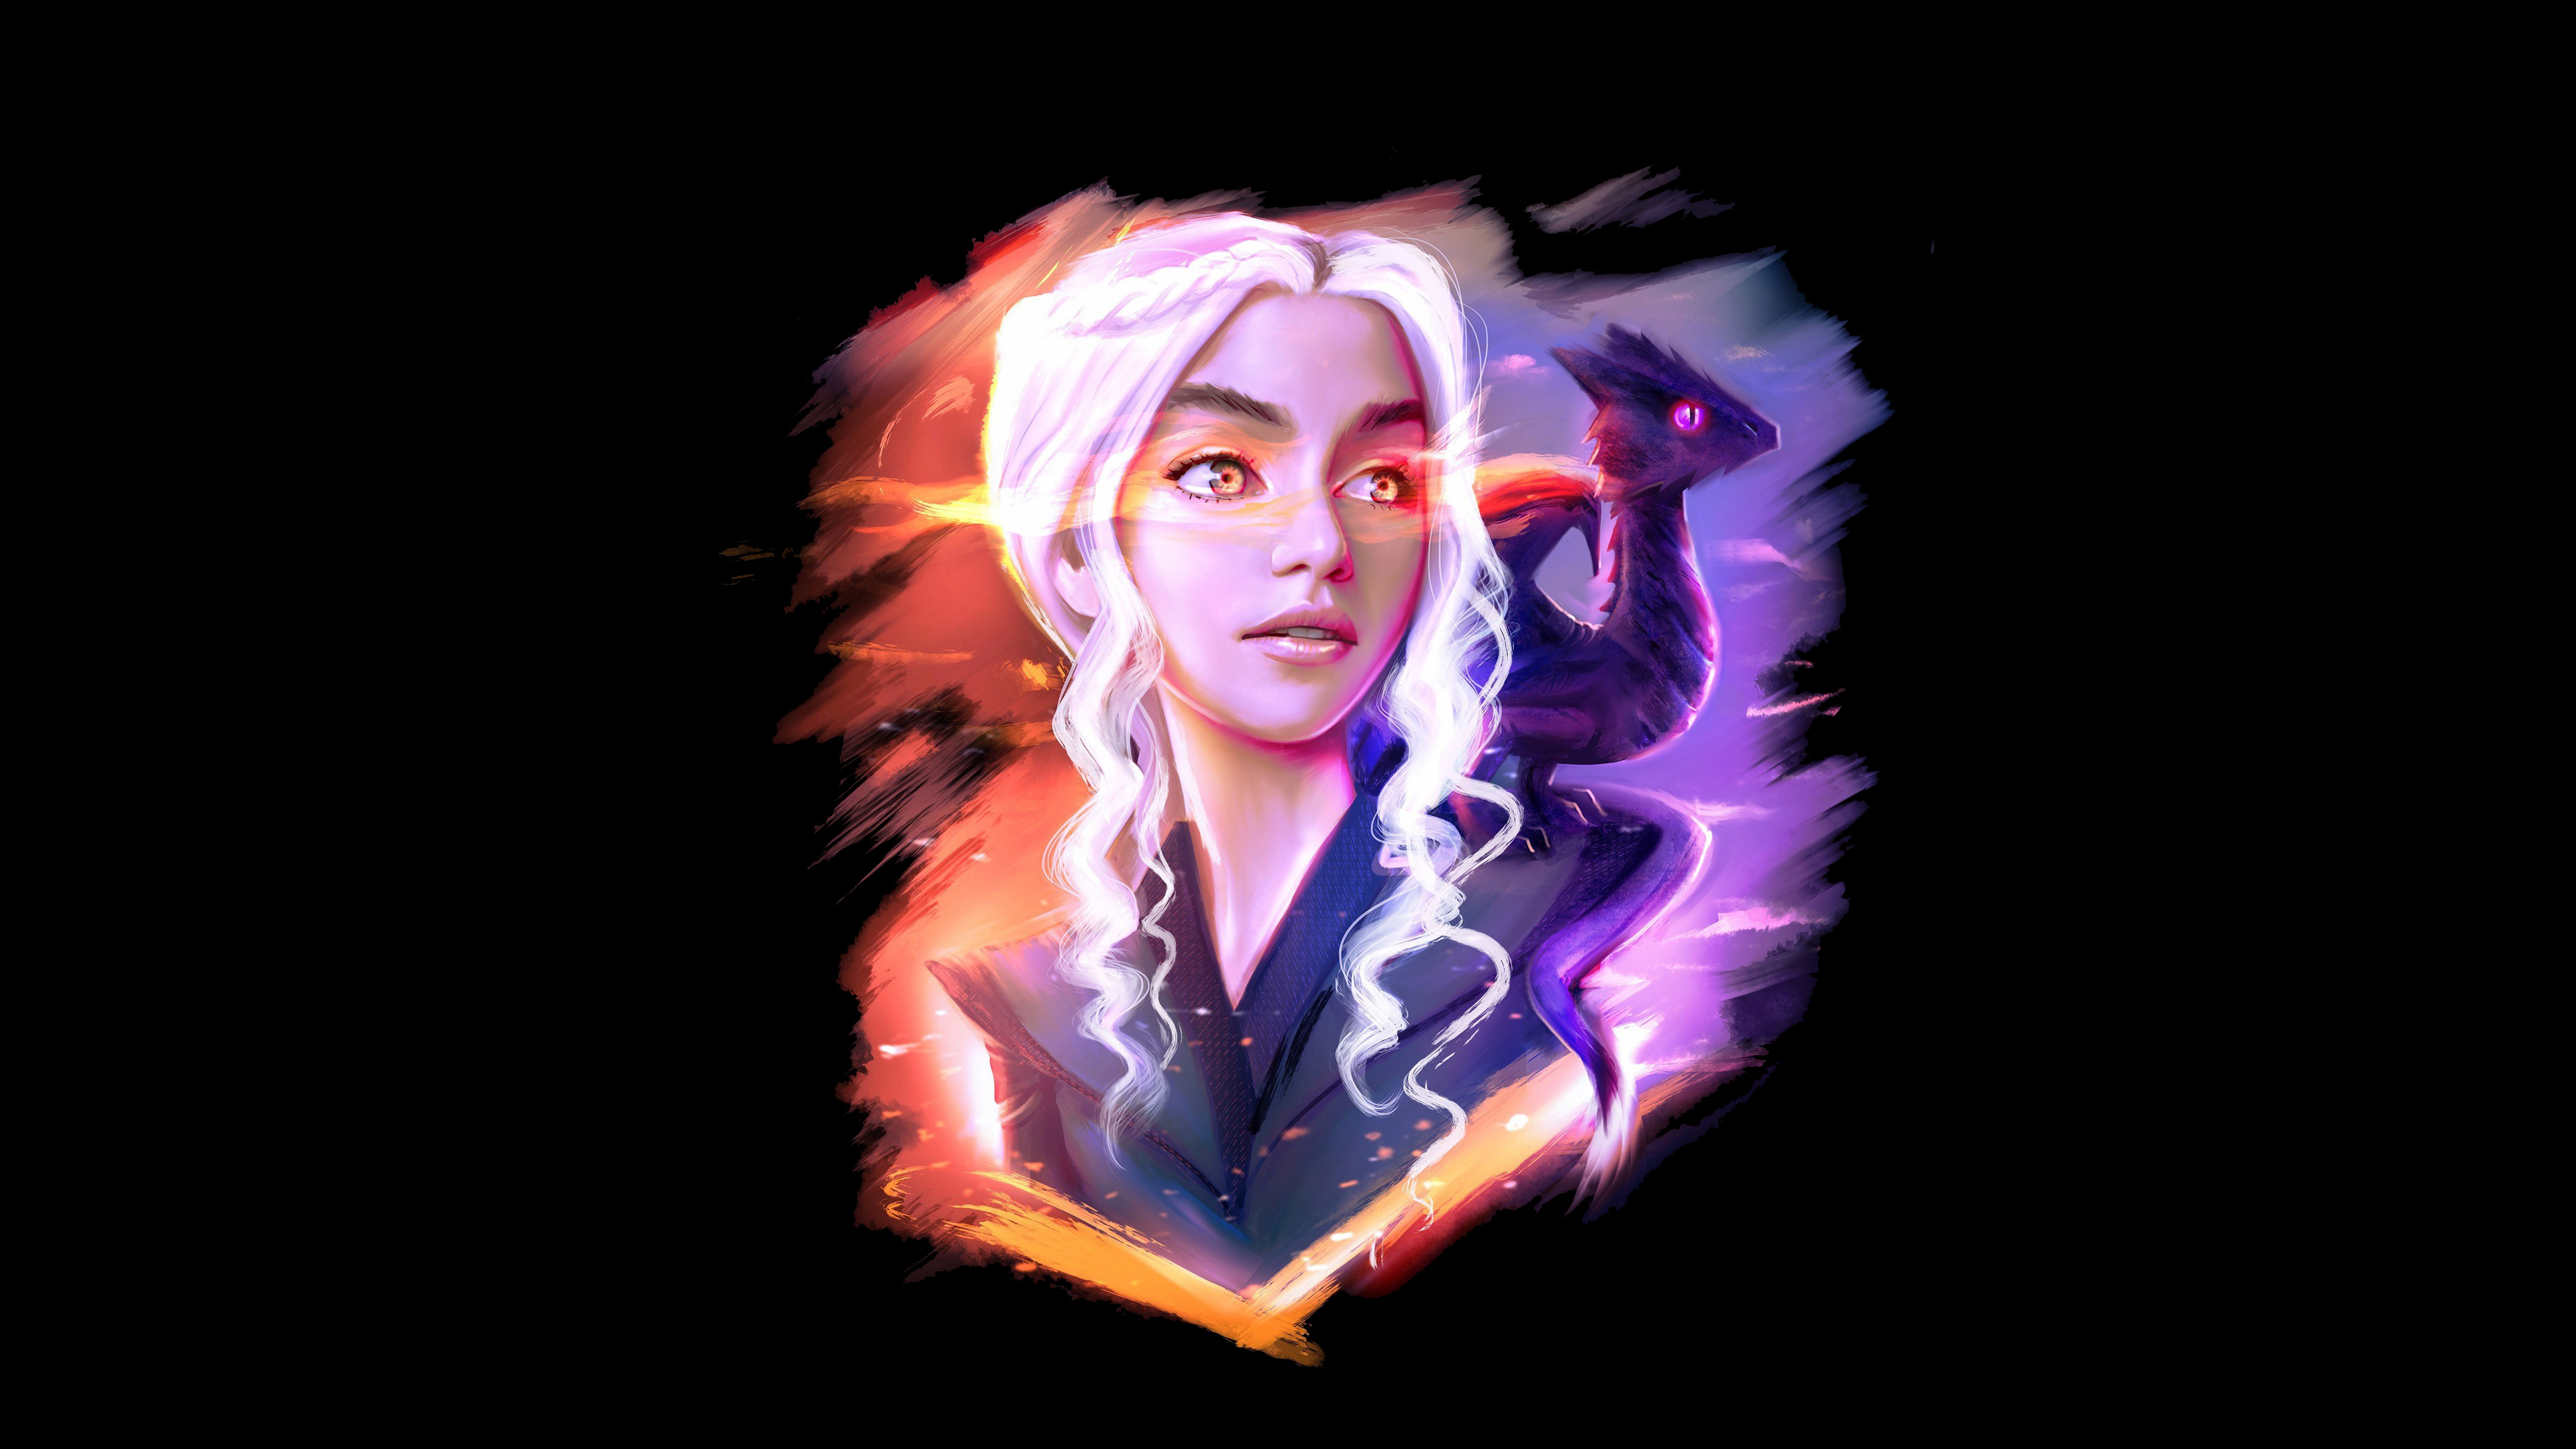 2048x2048 Game Girl Pubg 4k Ipad Air Hd 4k Wallpapers: 2048x2048 Daenerys Targaryen And Dragon Fan Art Ipad Air